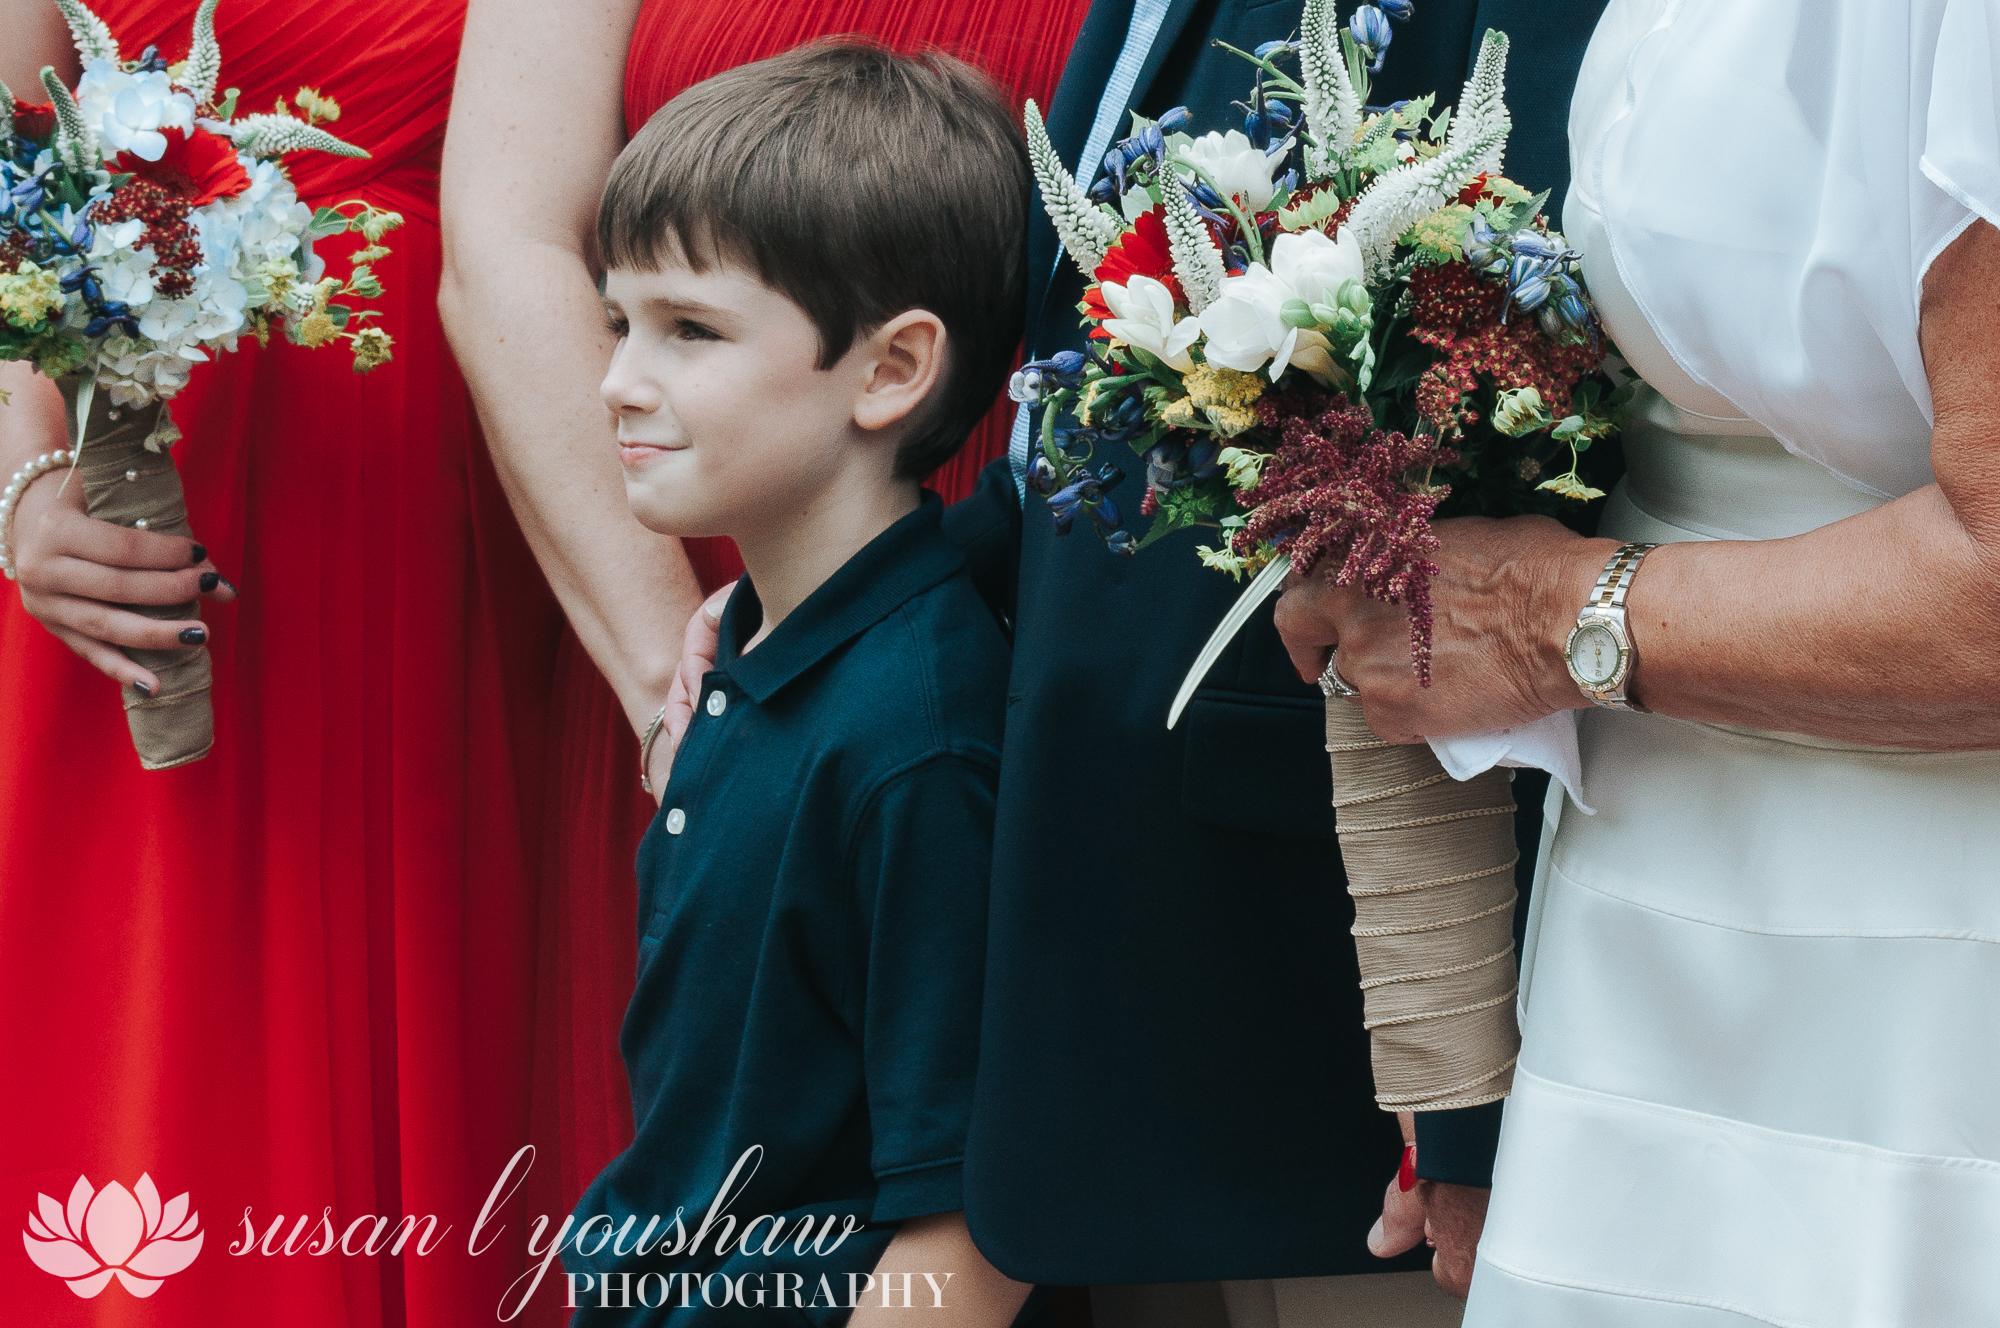 BLOG Carolyn Adams and Jim McCune 07-04-2018 SLY Photography-106.jpg